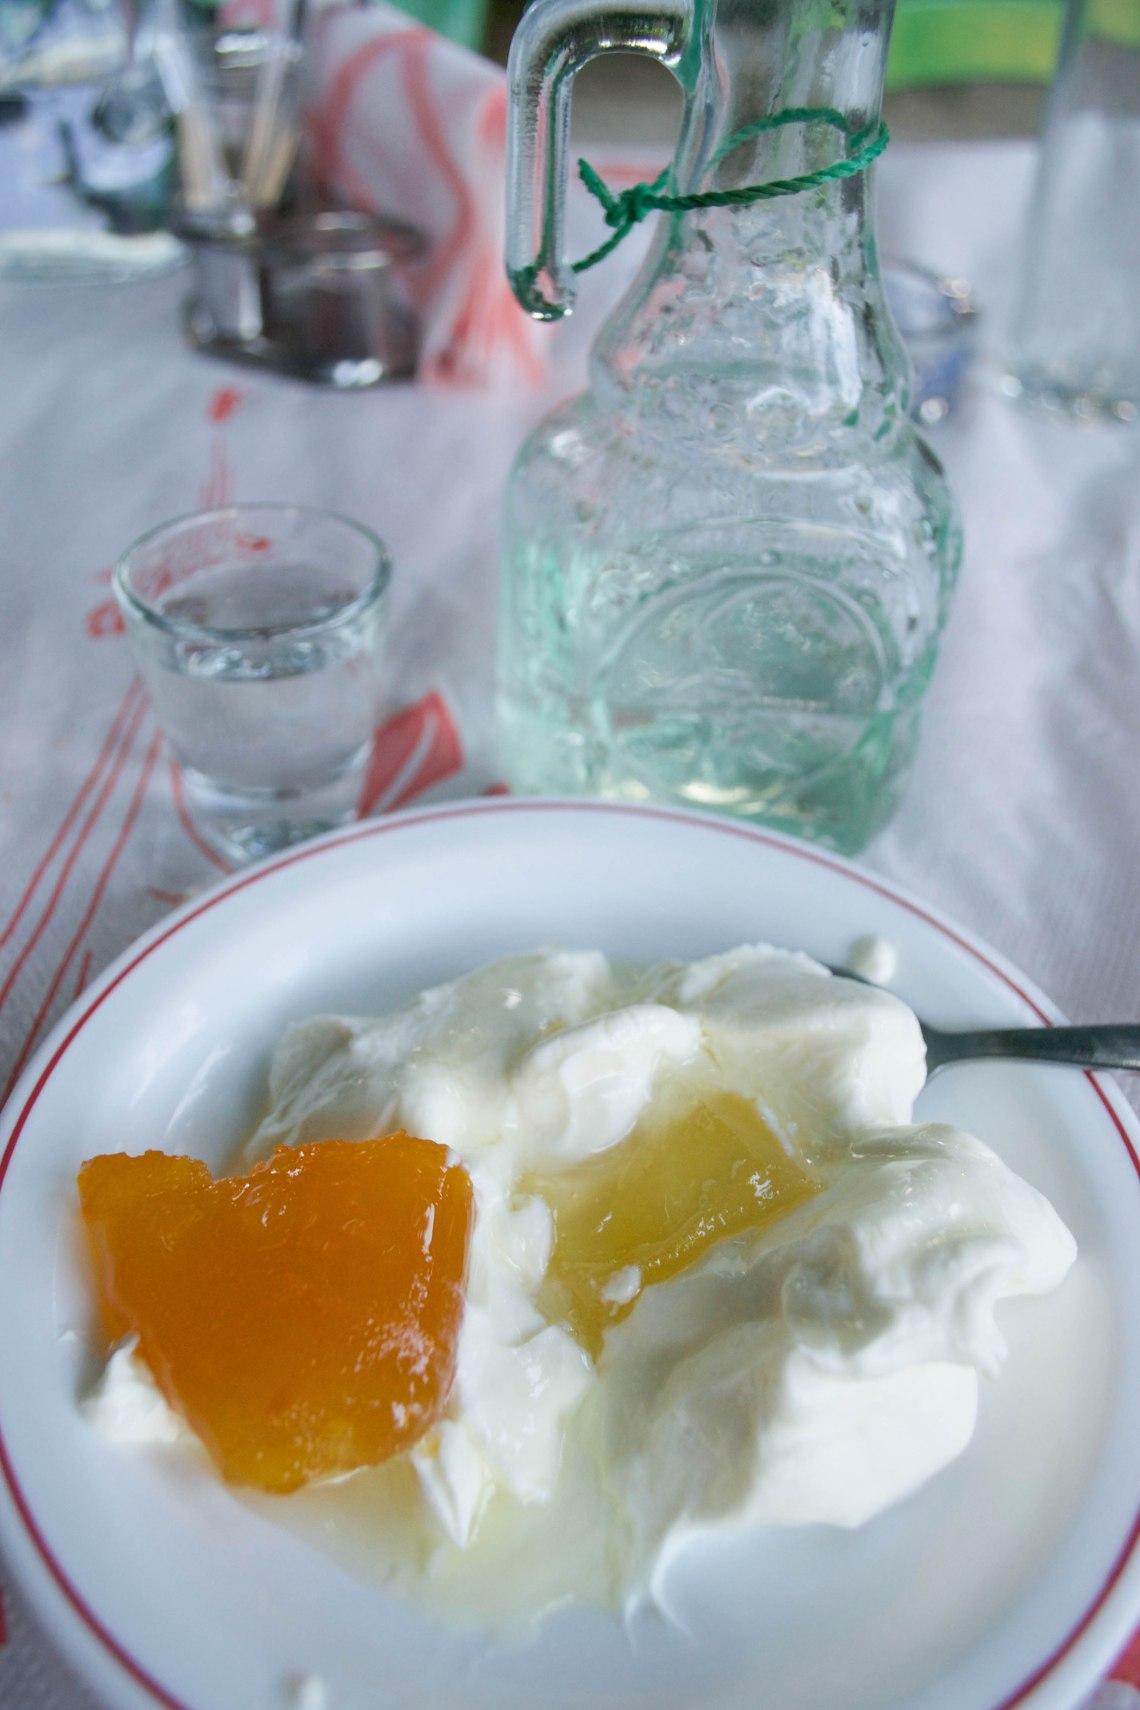 Yogurt - Crete, Greece